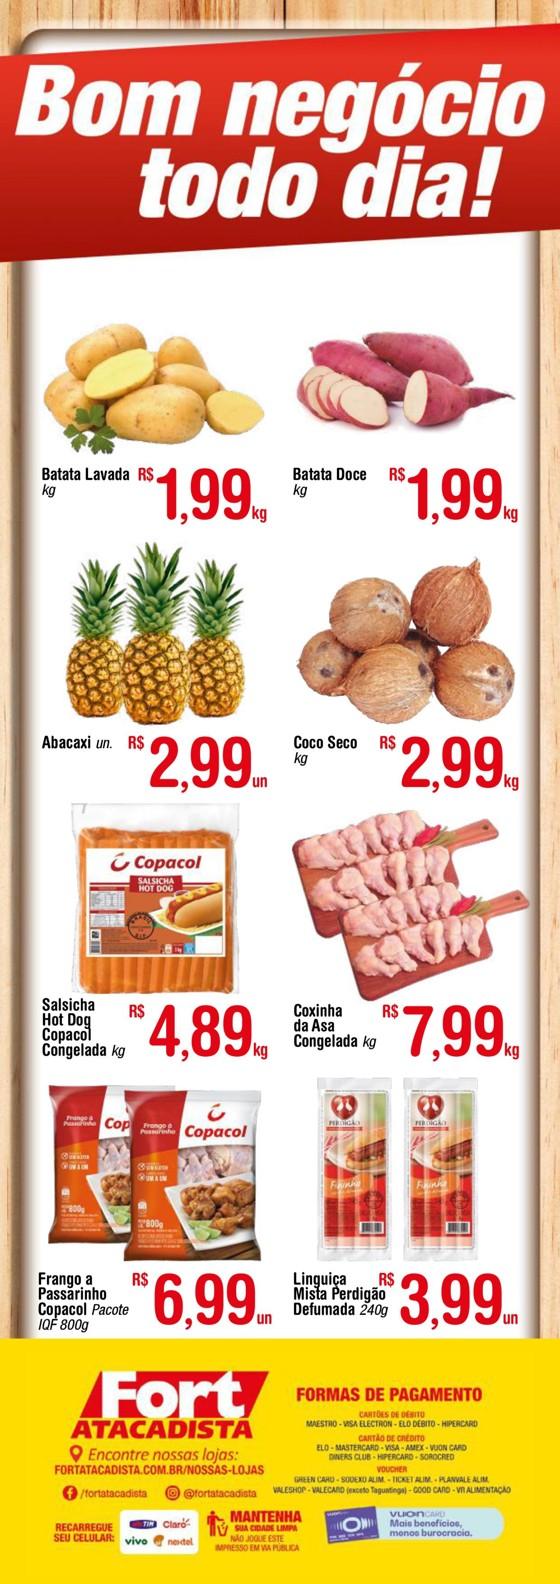 Ofertas supermercado FORT atacadista Verde vence 04-03-2